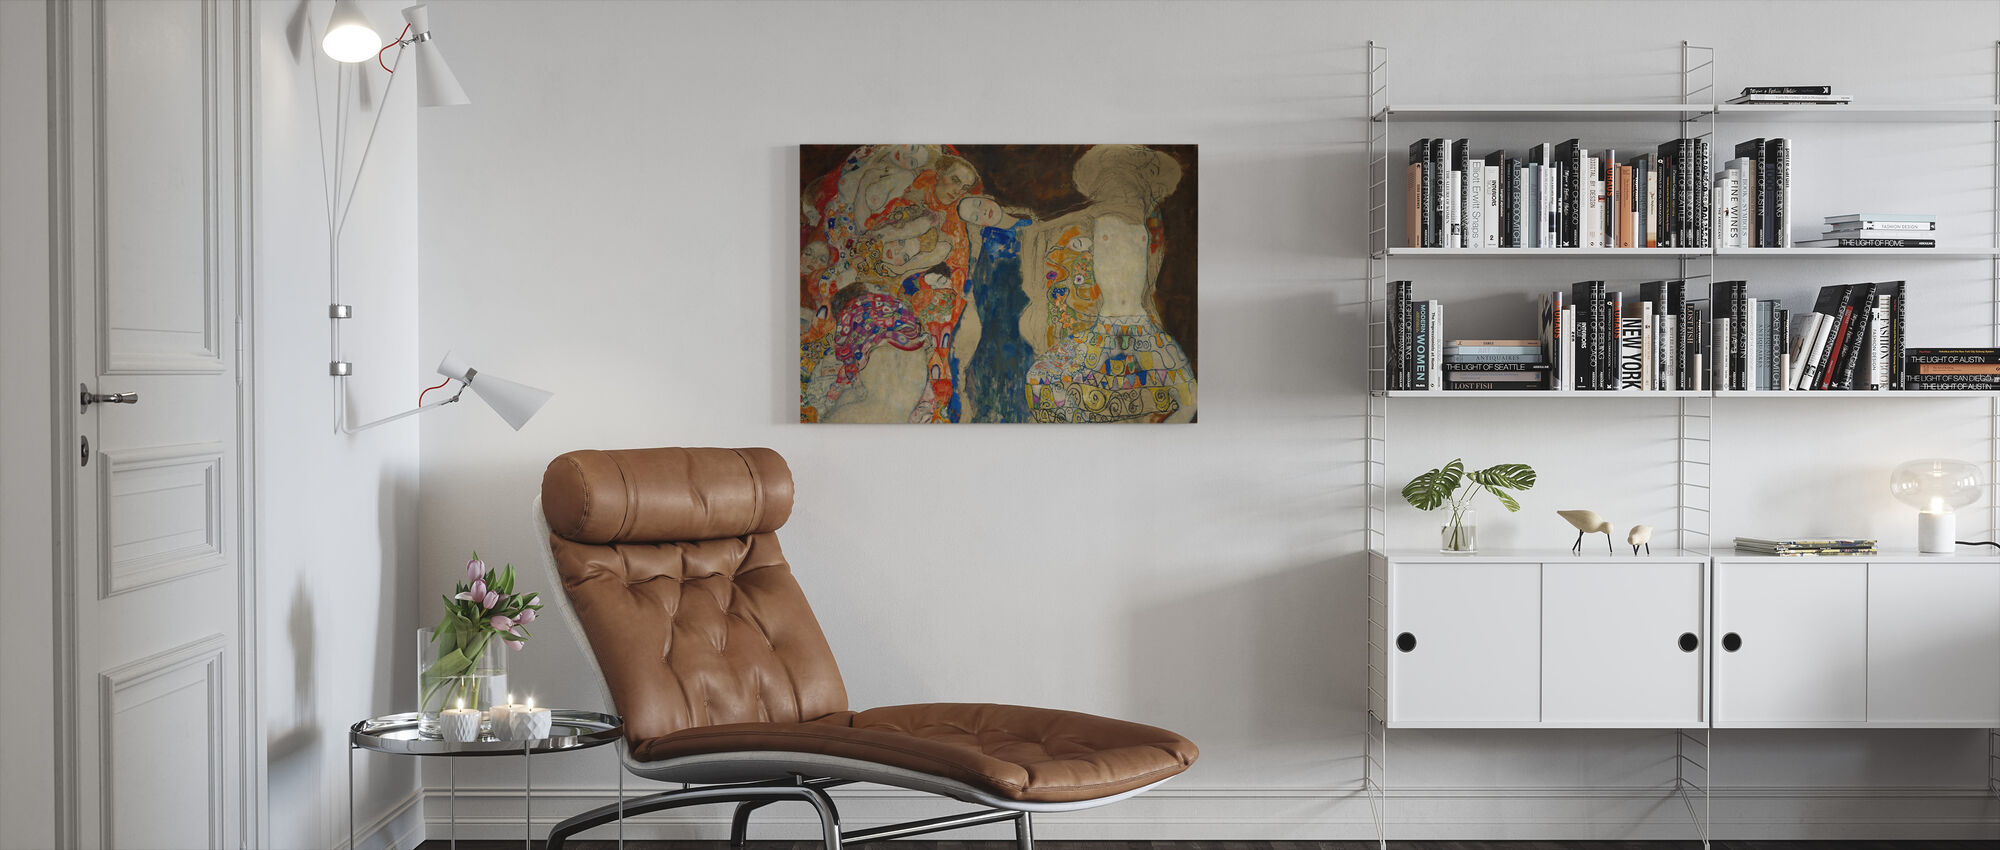 Bruid - Gustav Klimt - Canvas print - Woonkamer